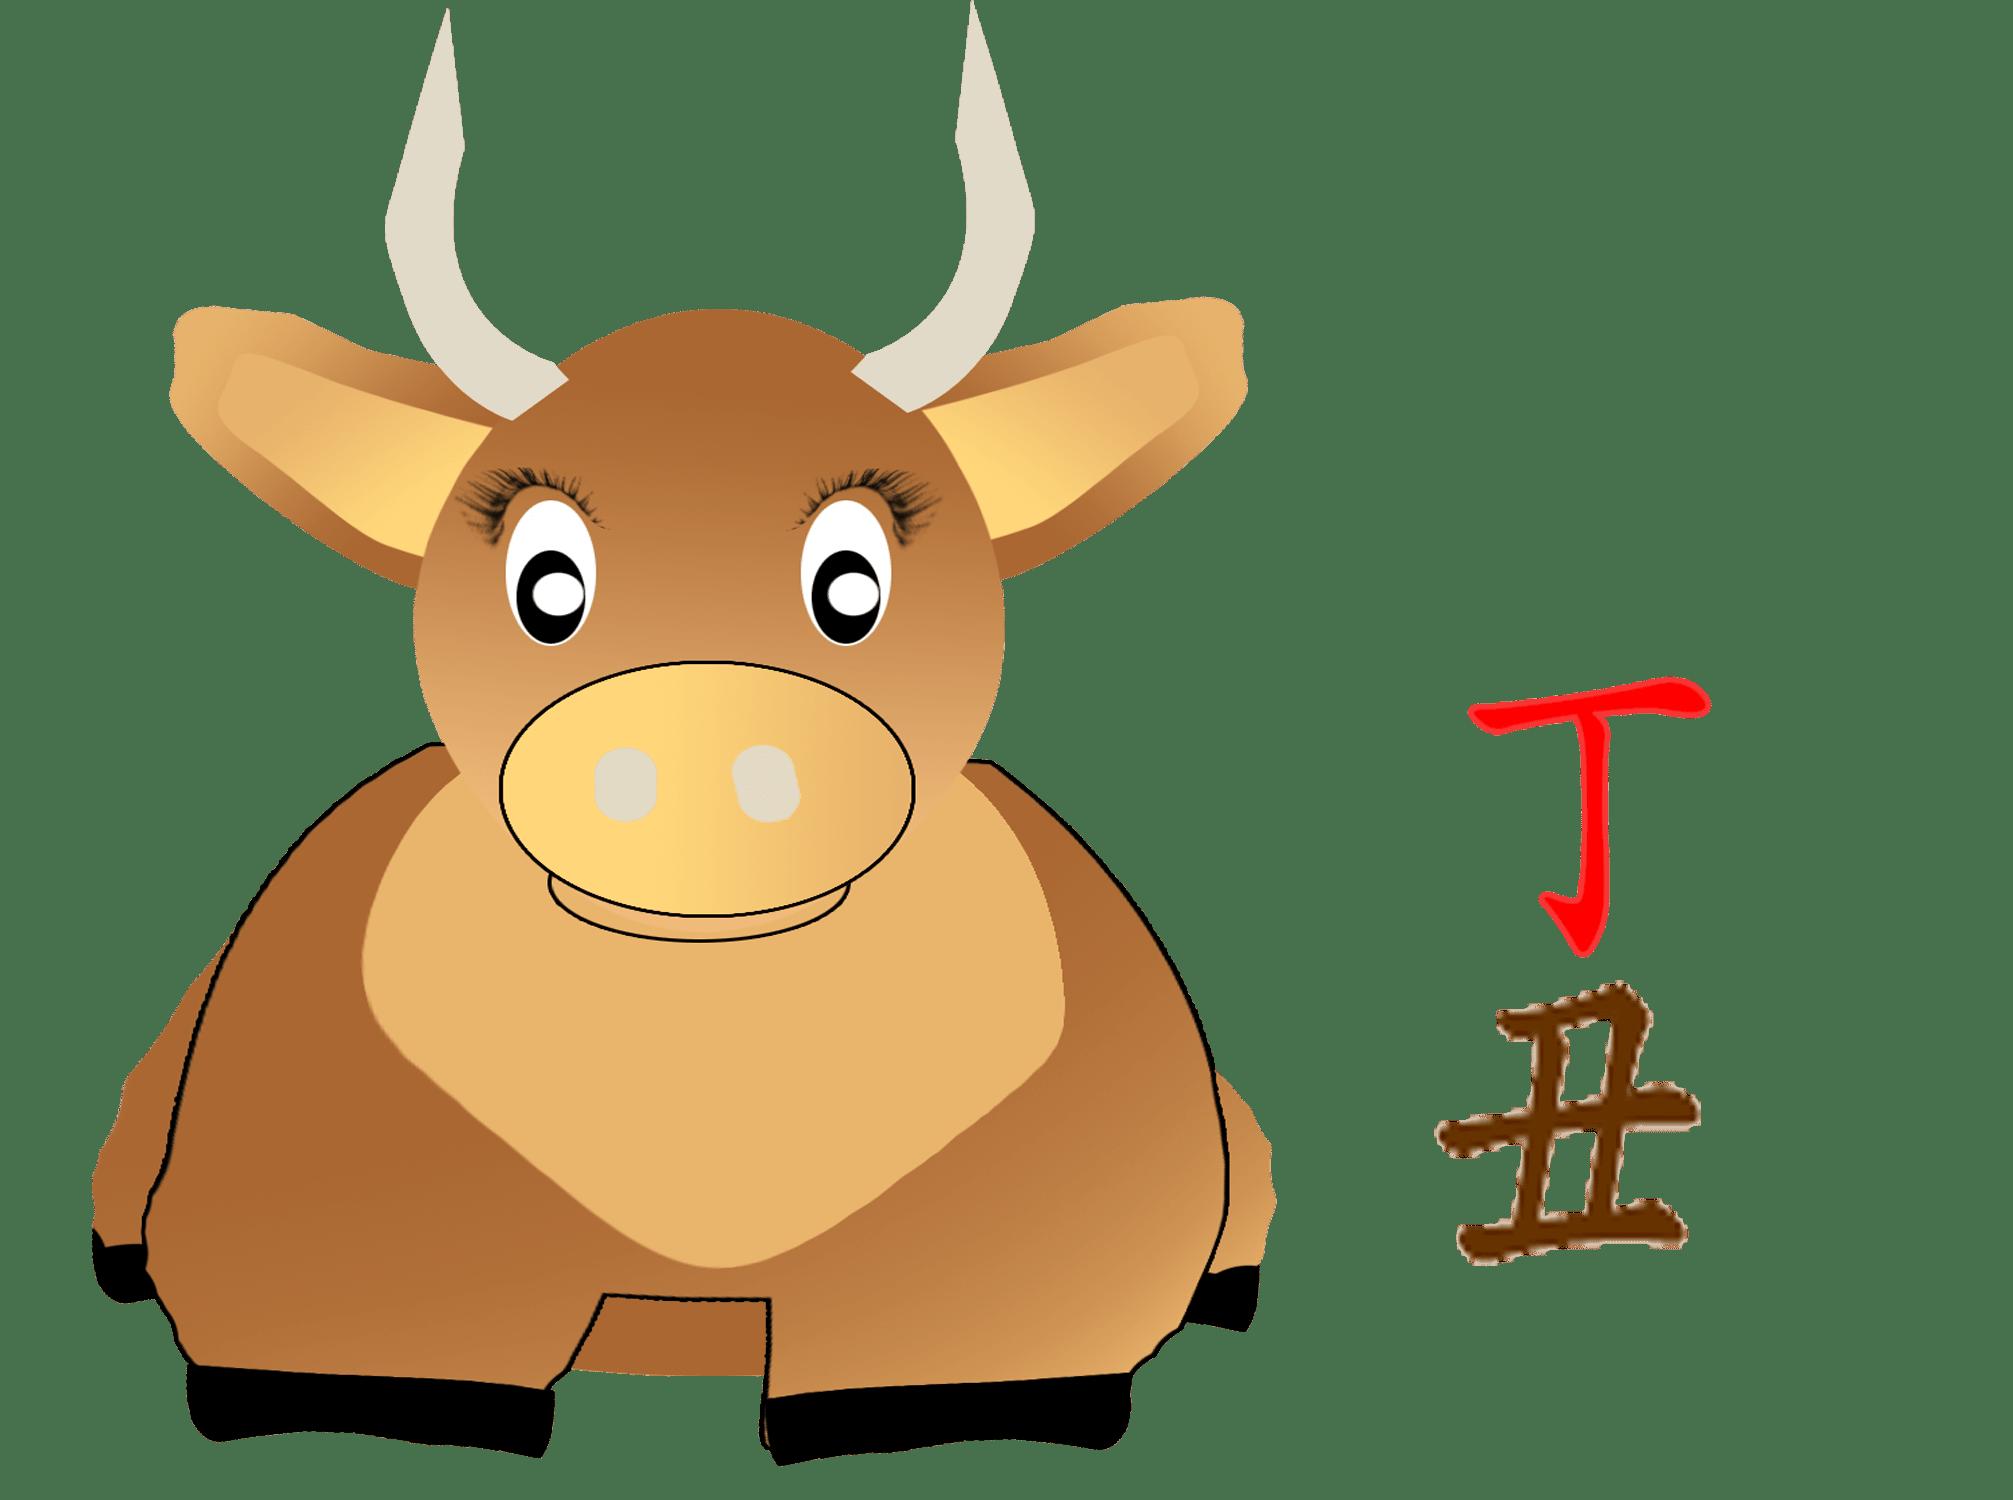 месяц 2019 года бык